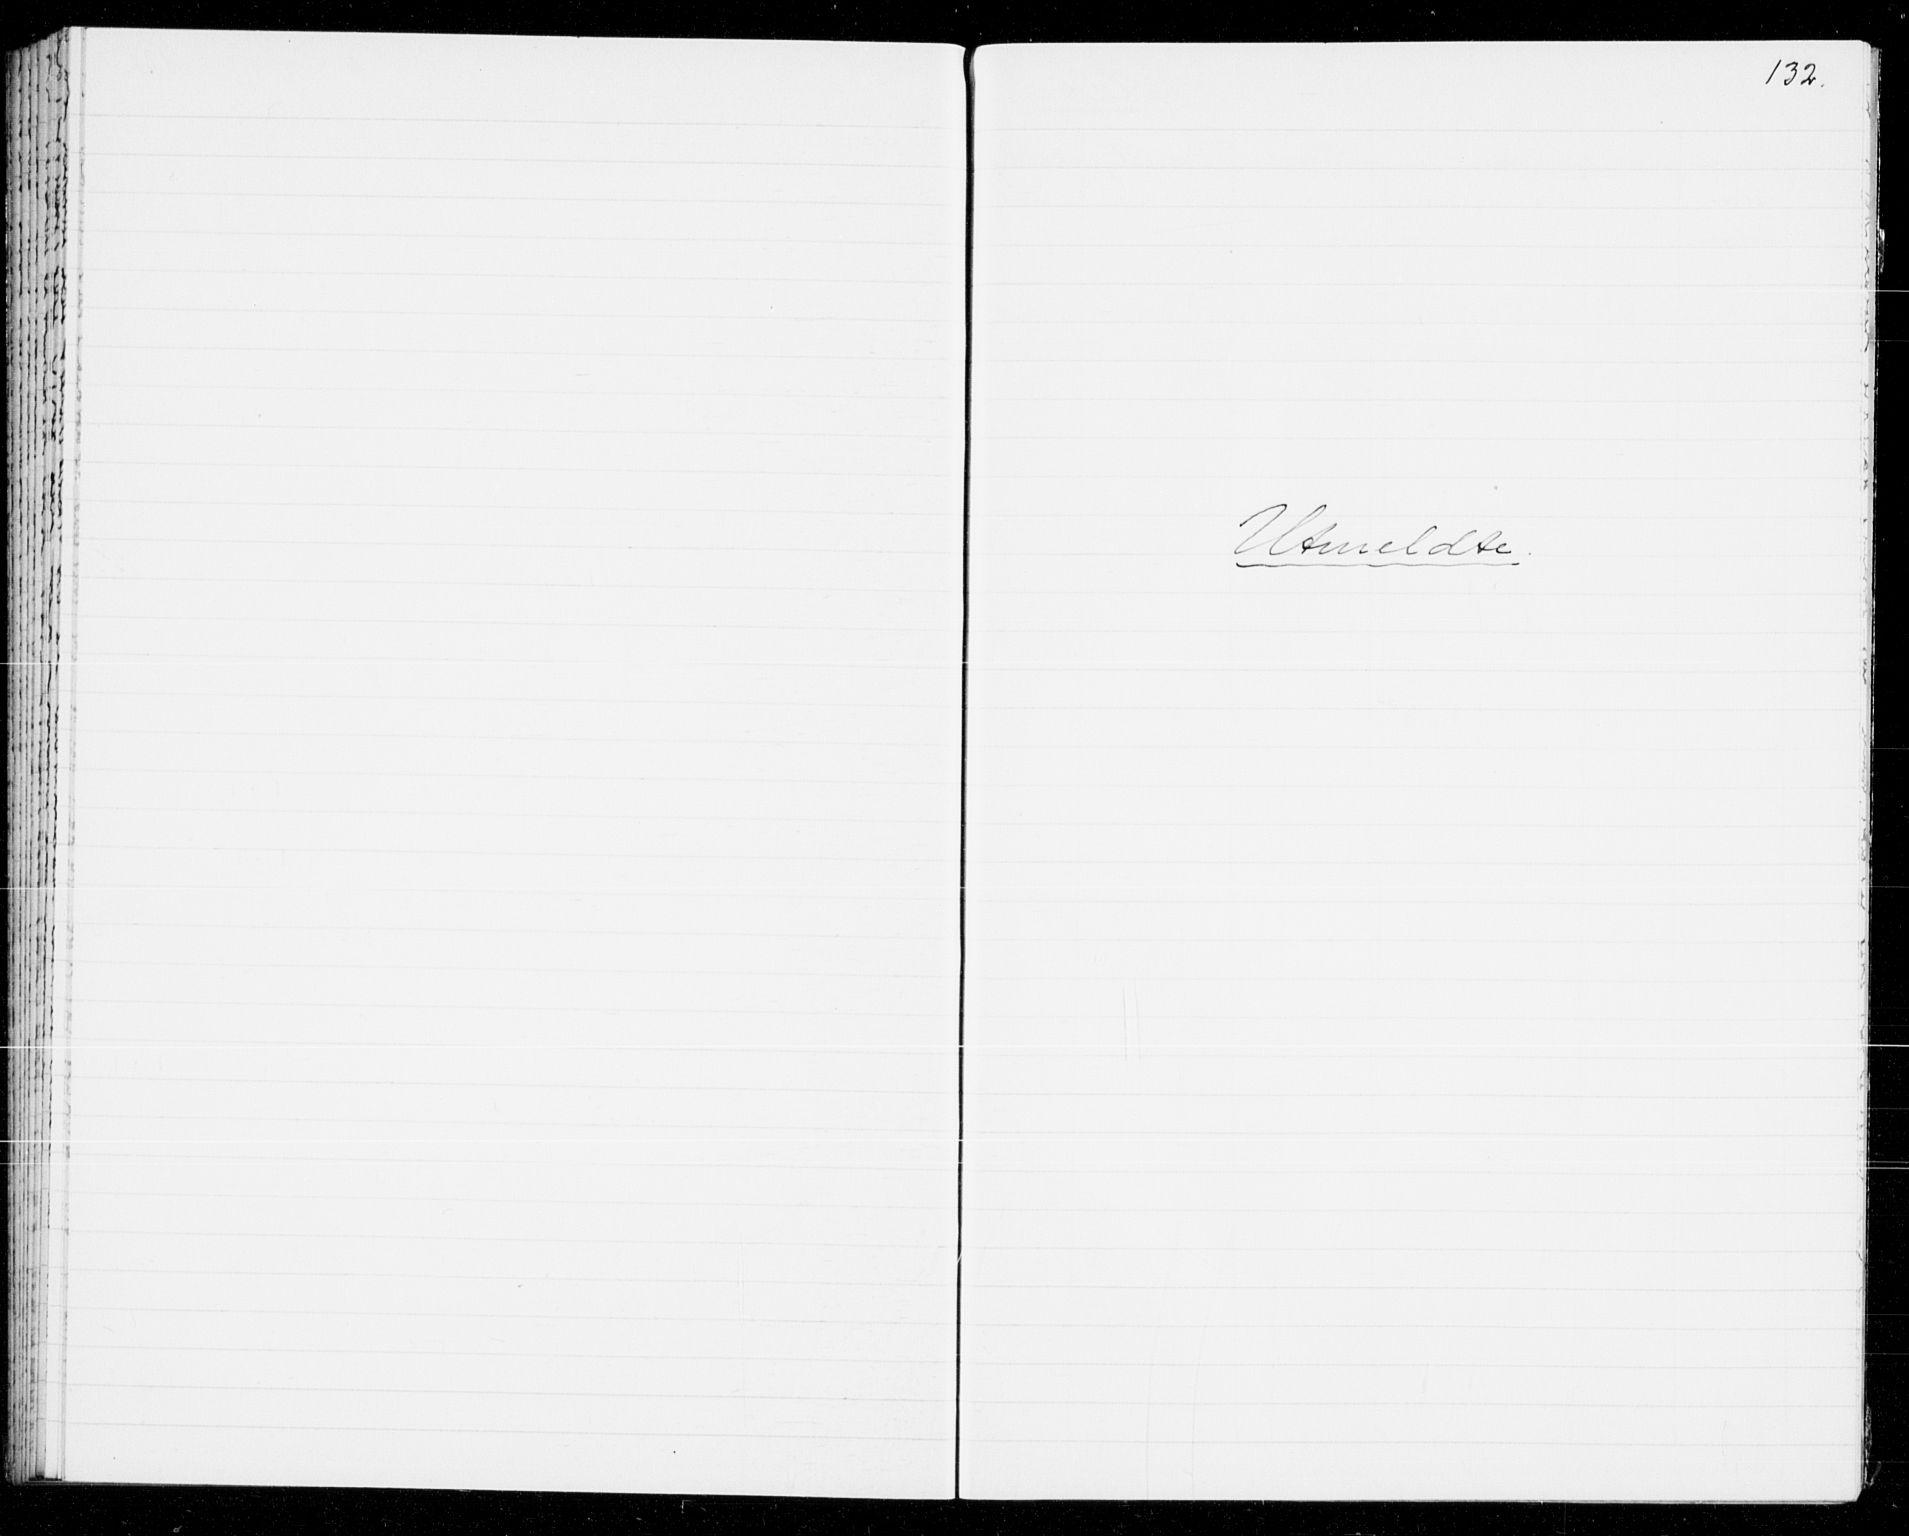 SAKO, Holla kirkebøker, G/Gb/L0004: Klokkerbok nr. II 4, 1942-1943, s. 132